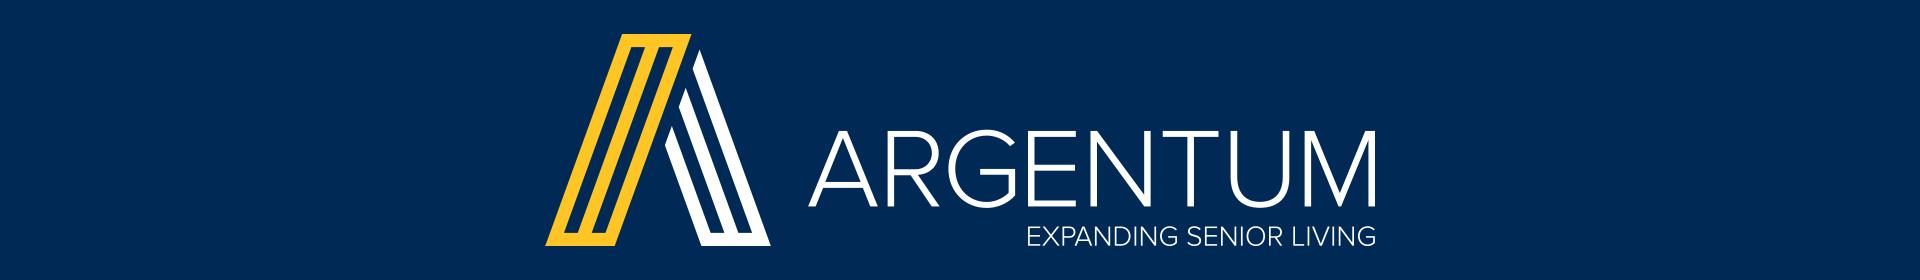 2019 Argentum Awards Event Banner